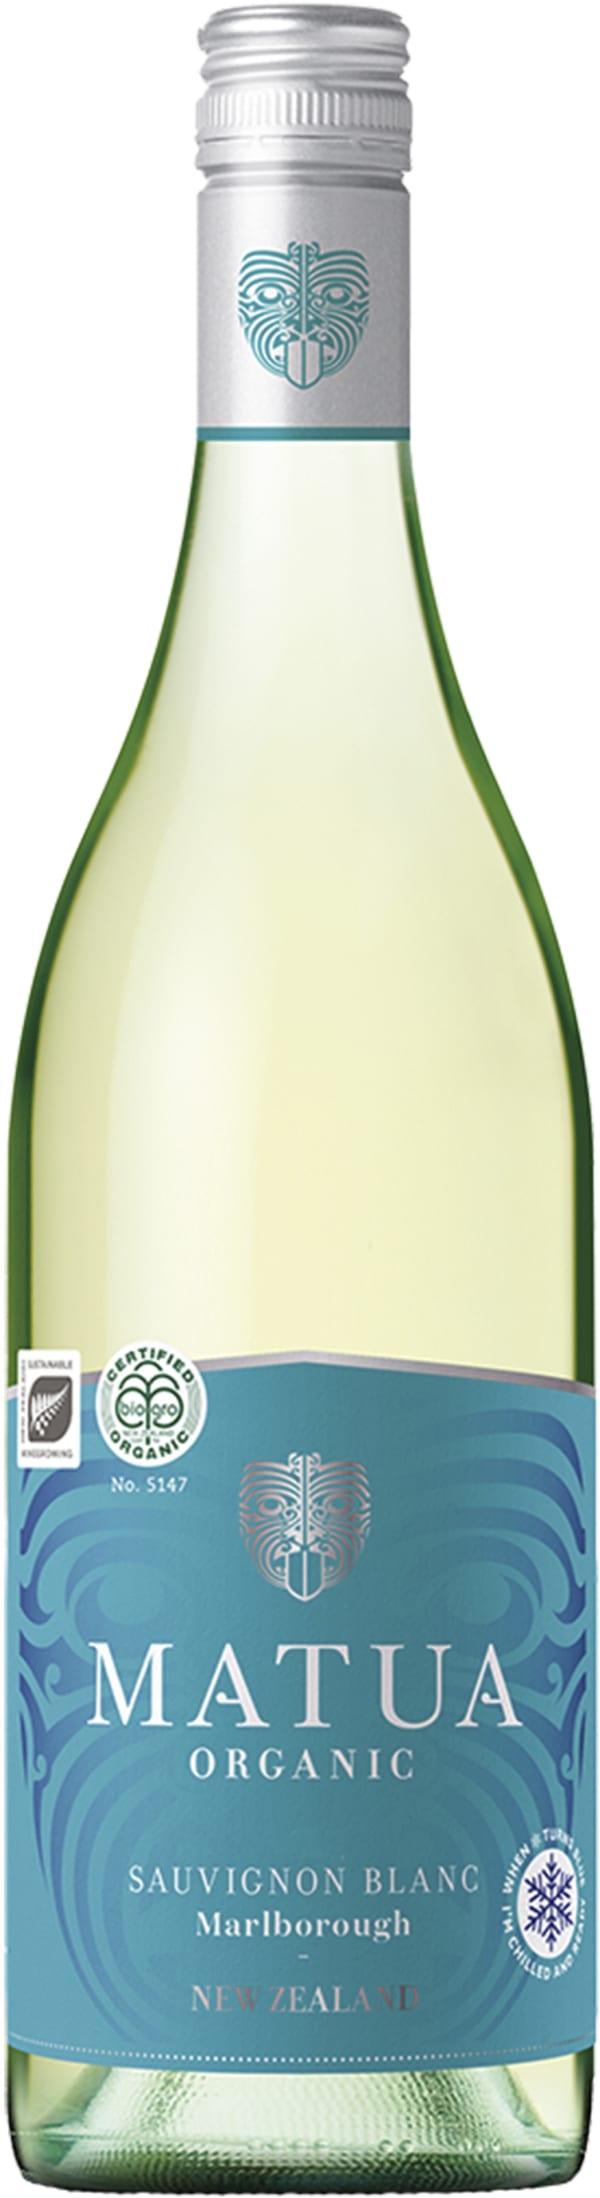 Matua Organic Sauvignon Blanc 2018